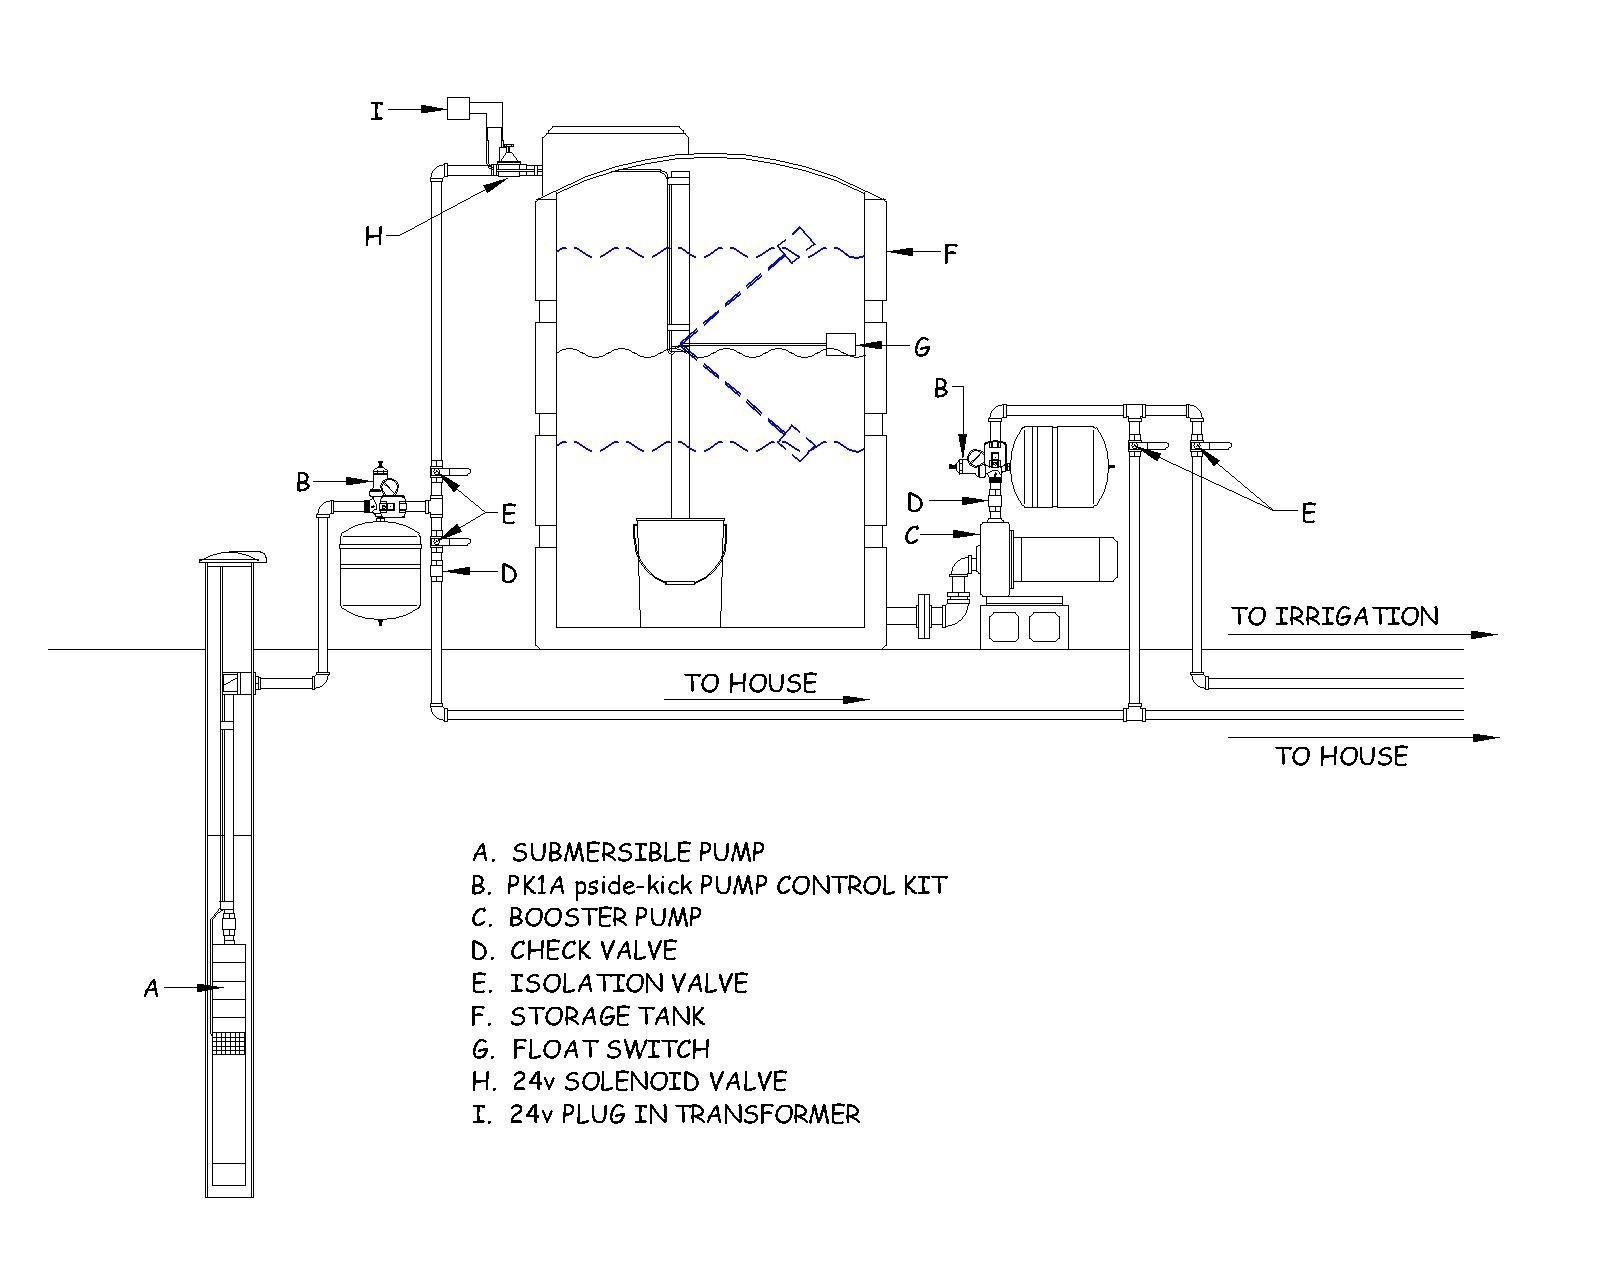 square d pumptrol pressure switch wiring diagram 12 lead electric motor well pump free